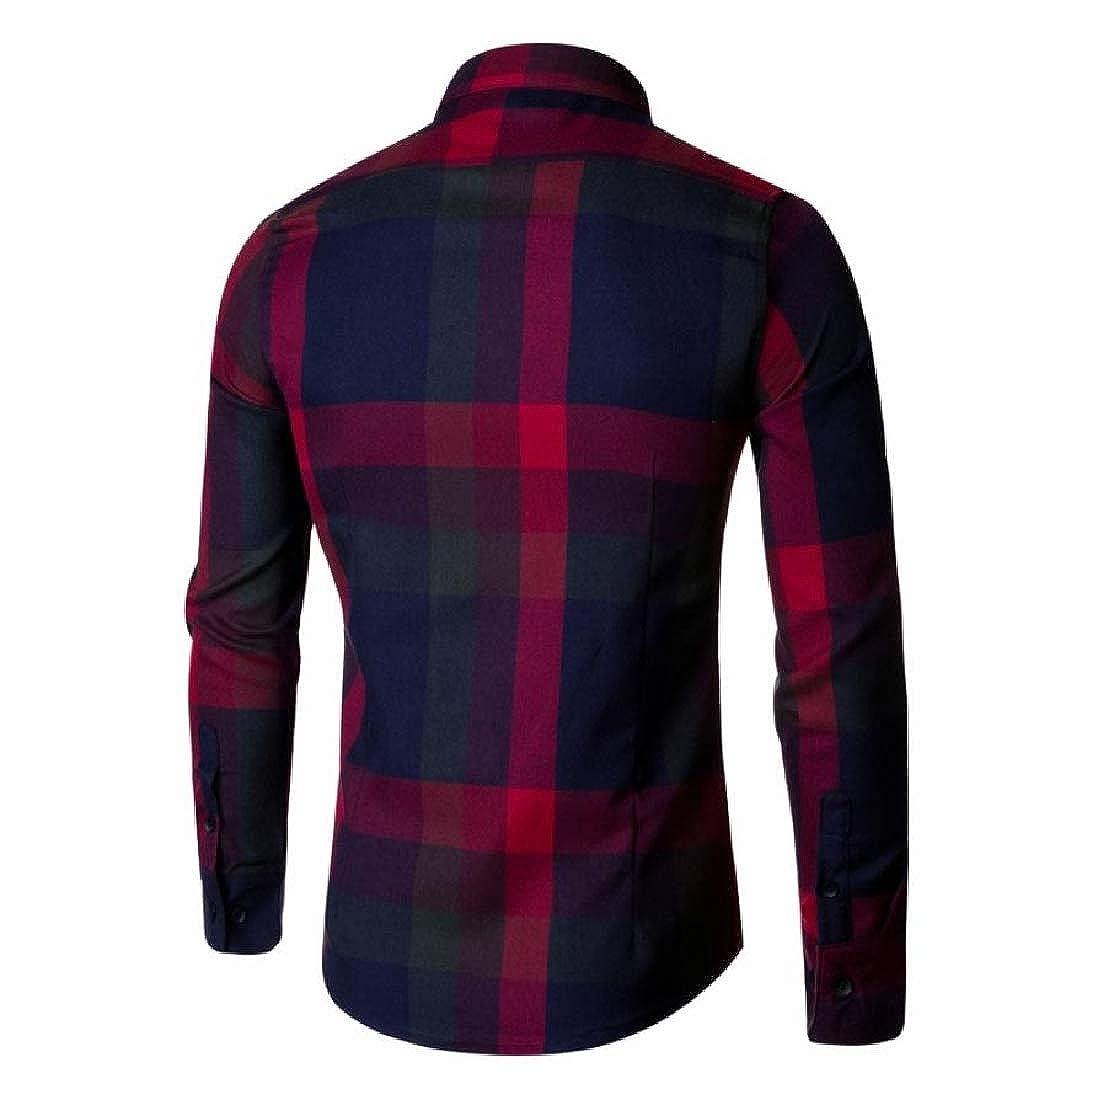 YUNY Men Tops Button-Down-Shirts Lattice Detail Comfortable Shirt Red 2XL